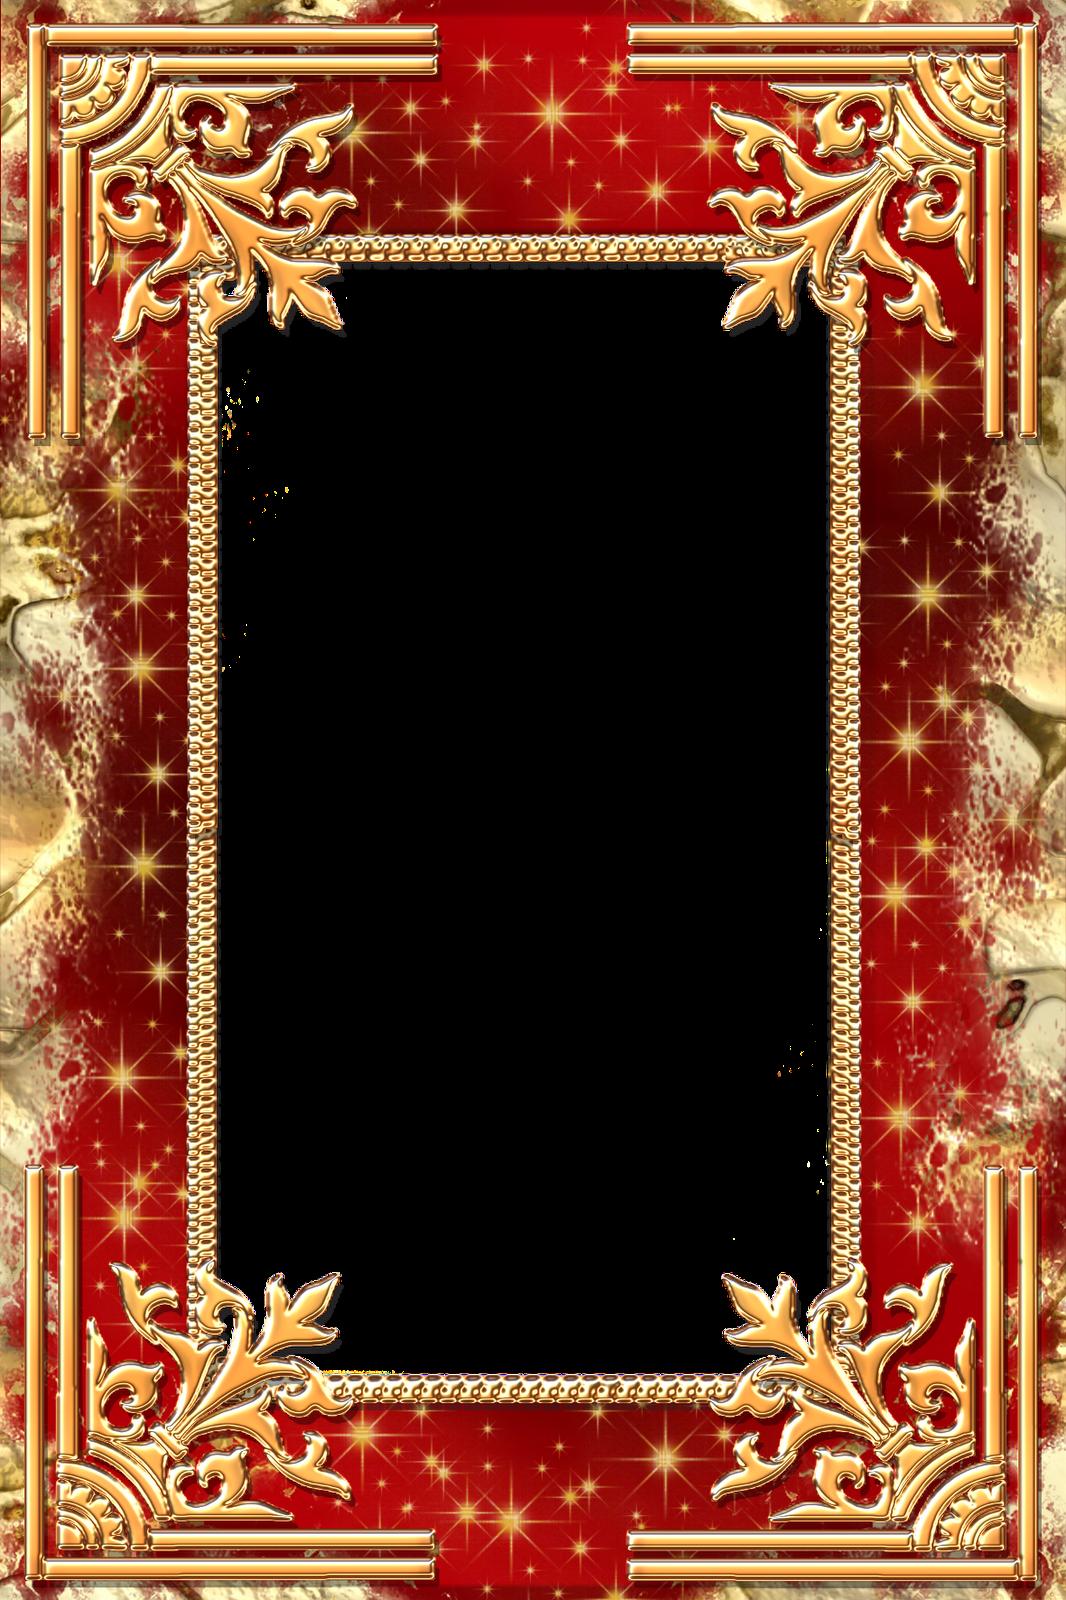 blank certificate templates kiddo shelter blank certificate 20 frames png com flores imagens png fundo transparente grátis